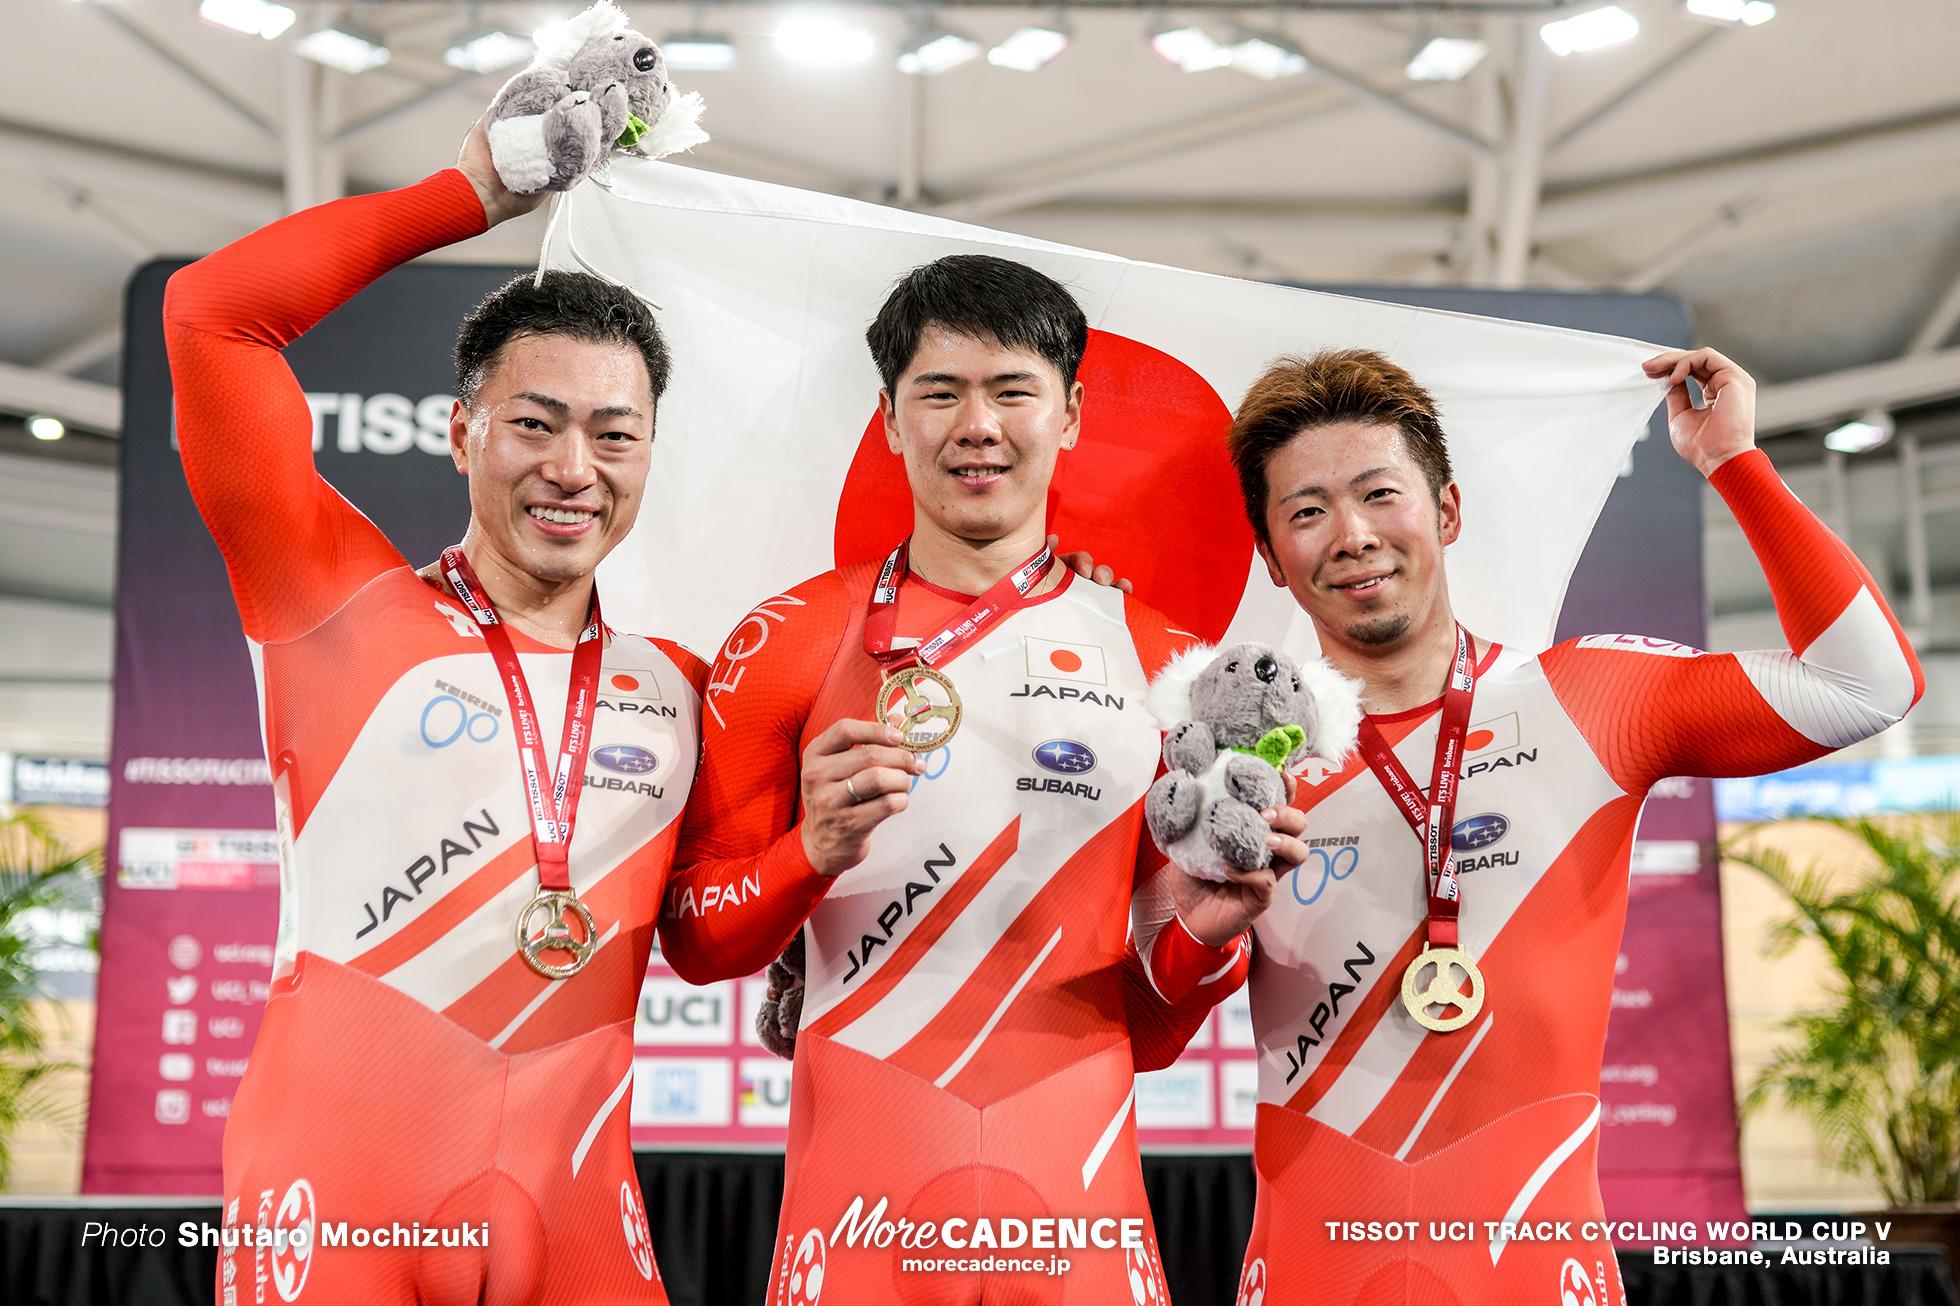 Final / Men's Team Sprint / TISSOT UCI TRACK CYCLING WORLD CUP V, Brisbane, Australia, 深谷知広 長迫吉拓 新田祐大